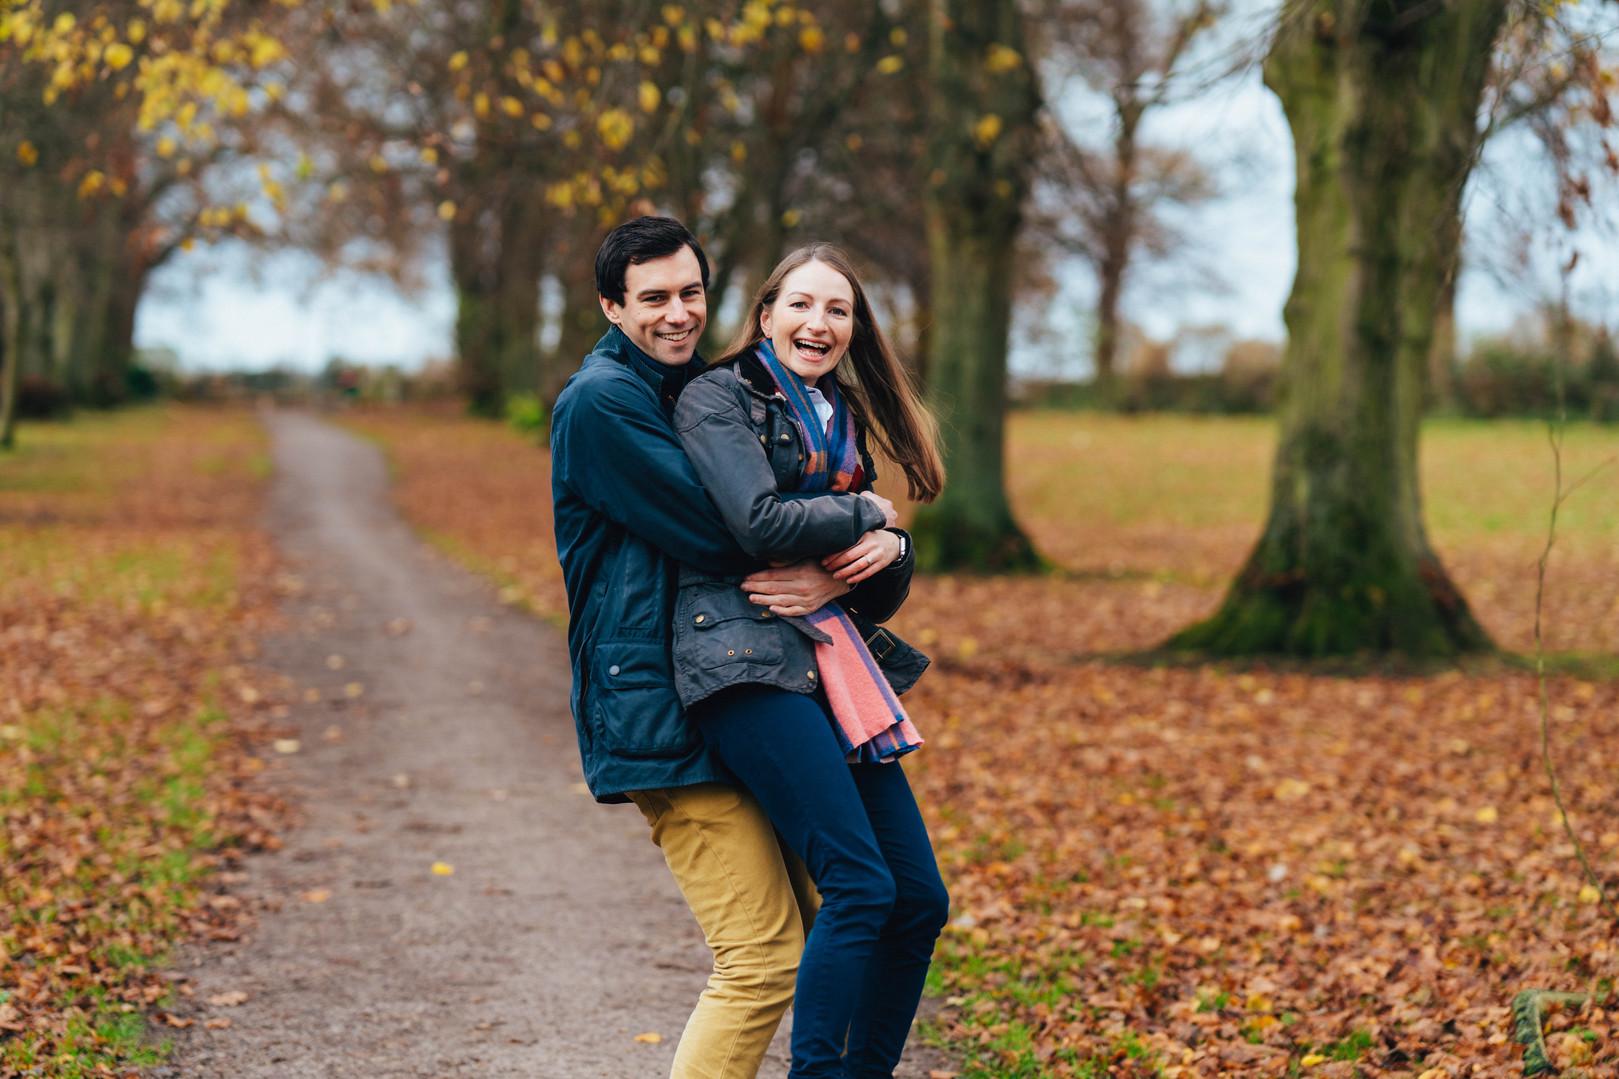 S&J, Autumn Engagement Session, Moreton,